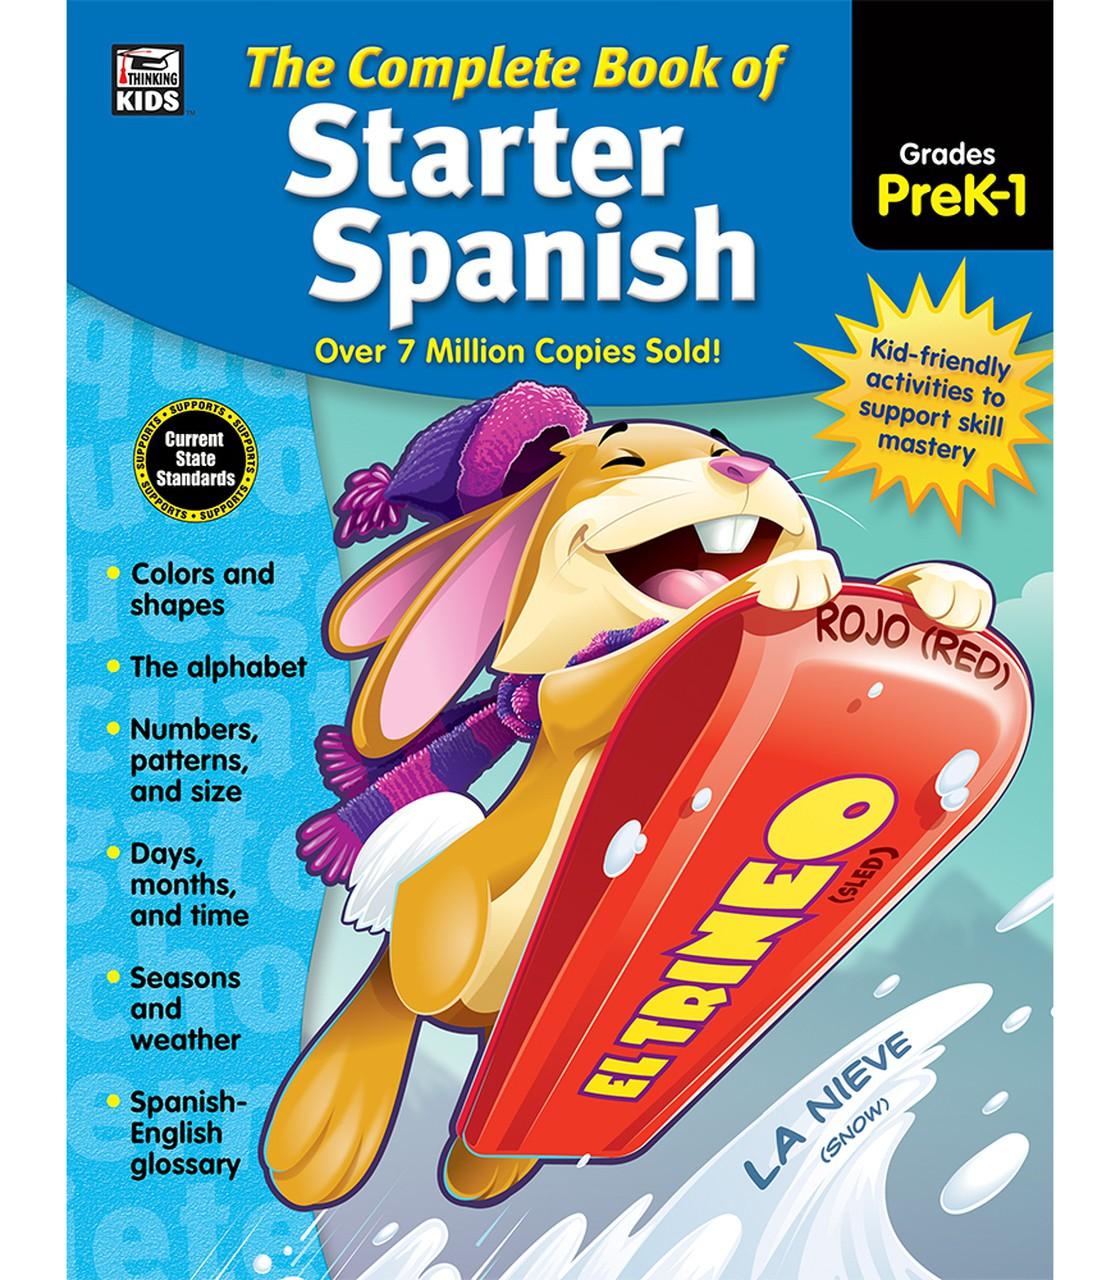 The Complete Book of Starter Spanish Workbook